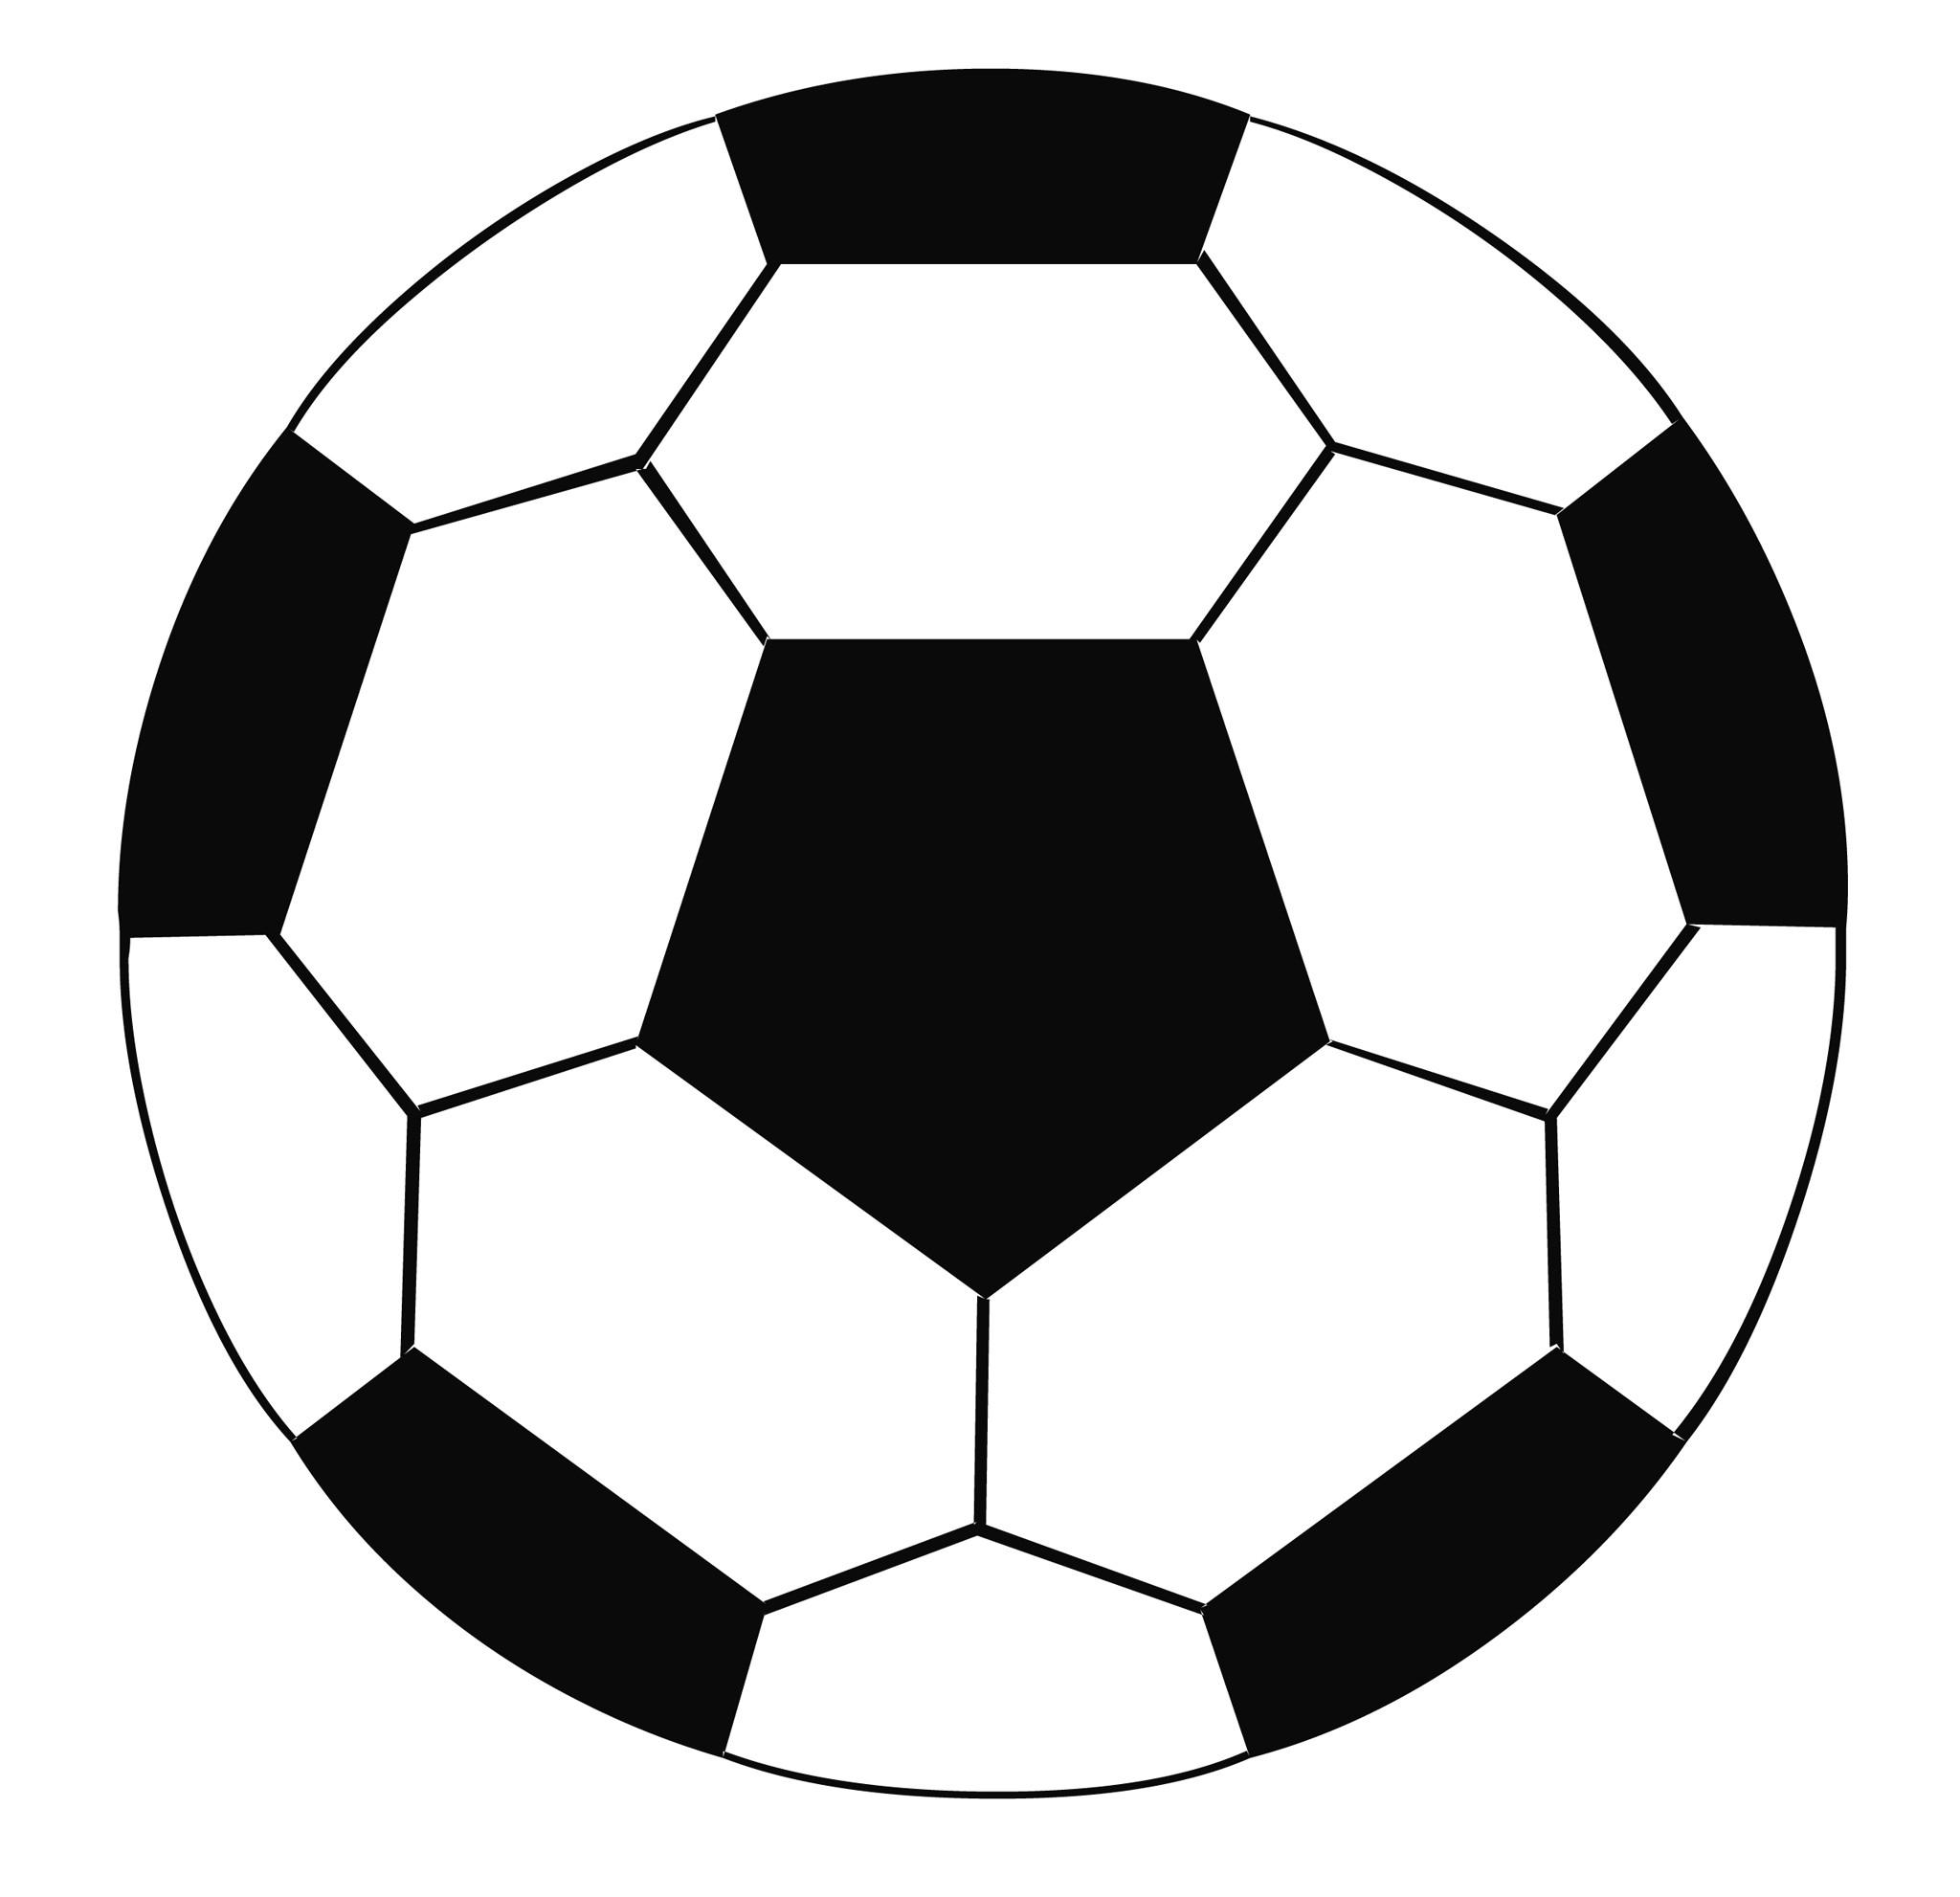 2048x1982 Soccer Ball And Clip Art